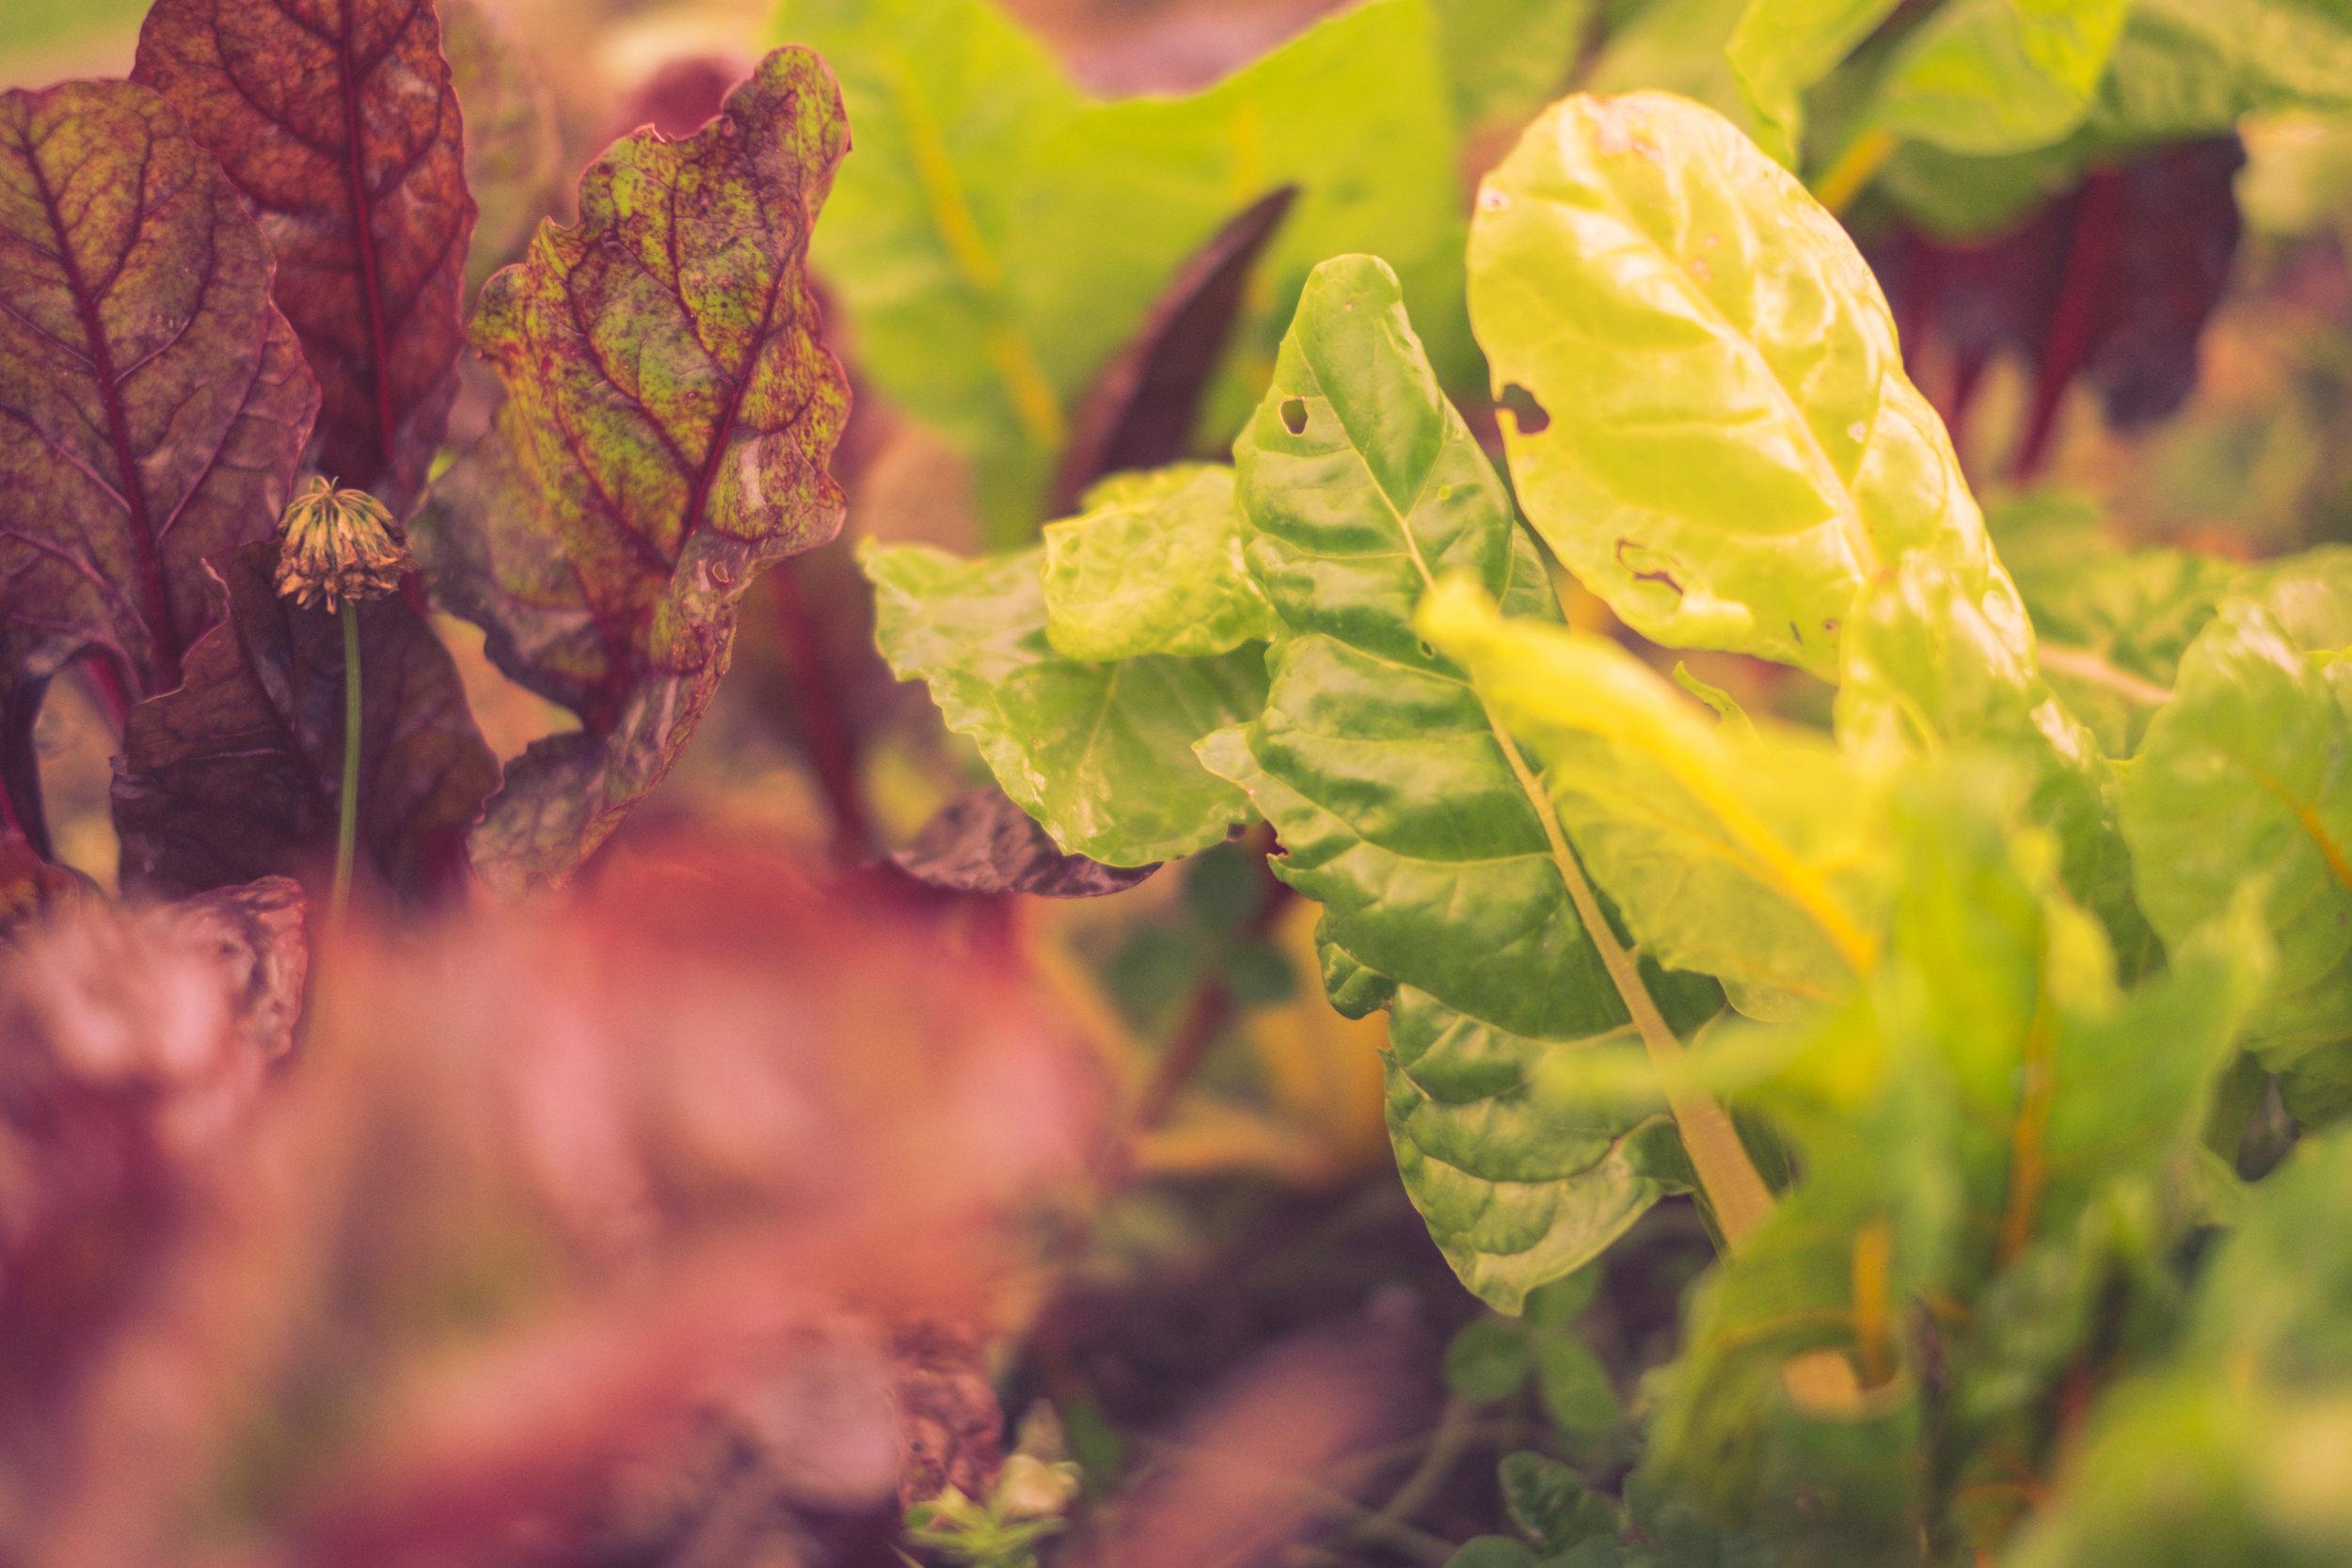 Garden-Saladish 1 Color-DSCF3035.jpg